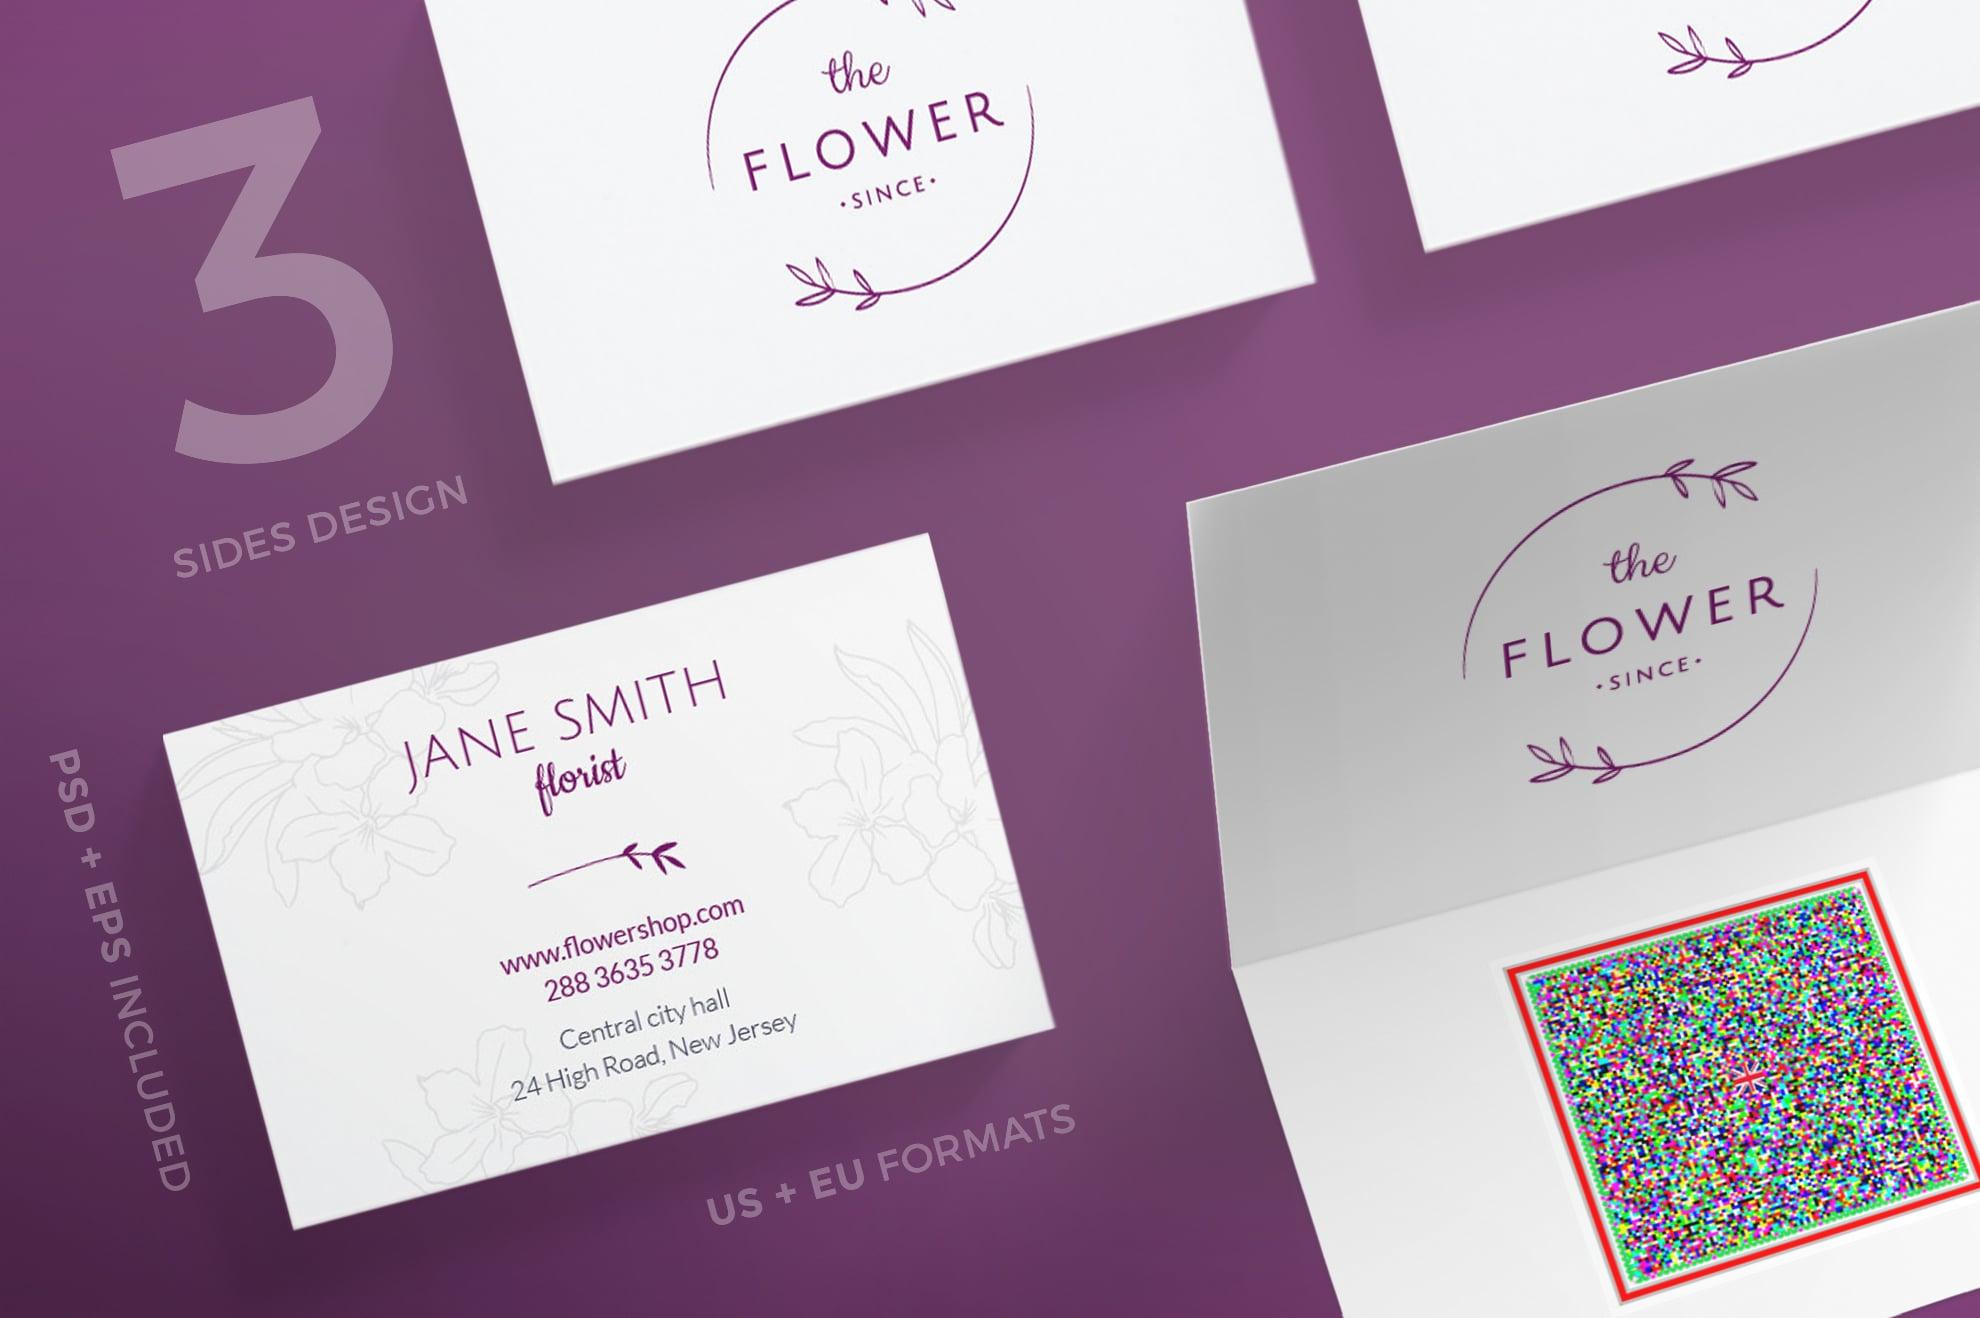 110 in 1 Business Card Bundle - 025 bc flower shop 49 0